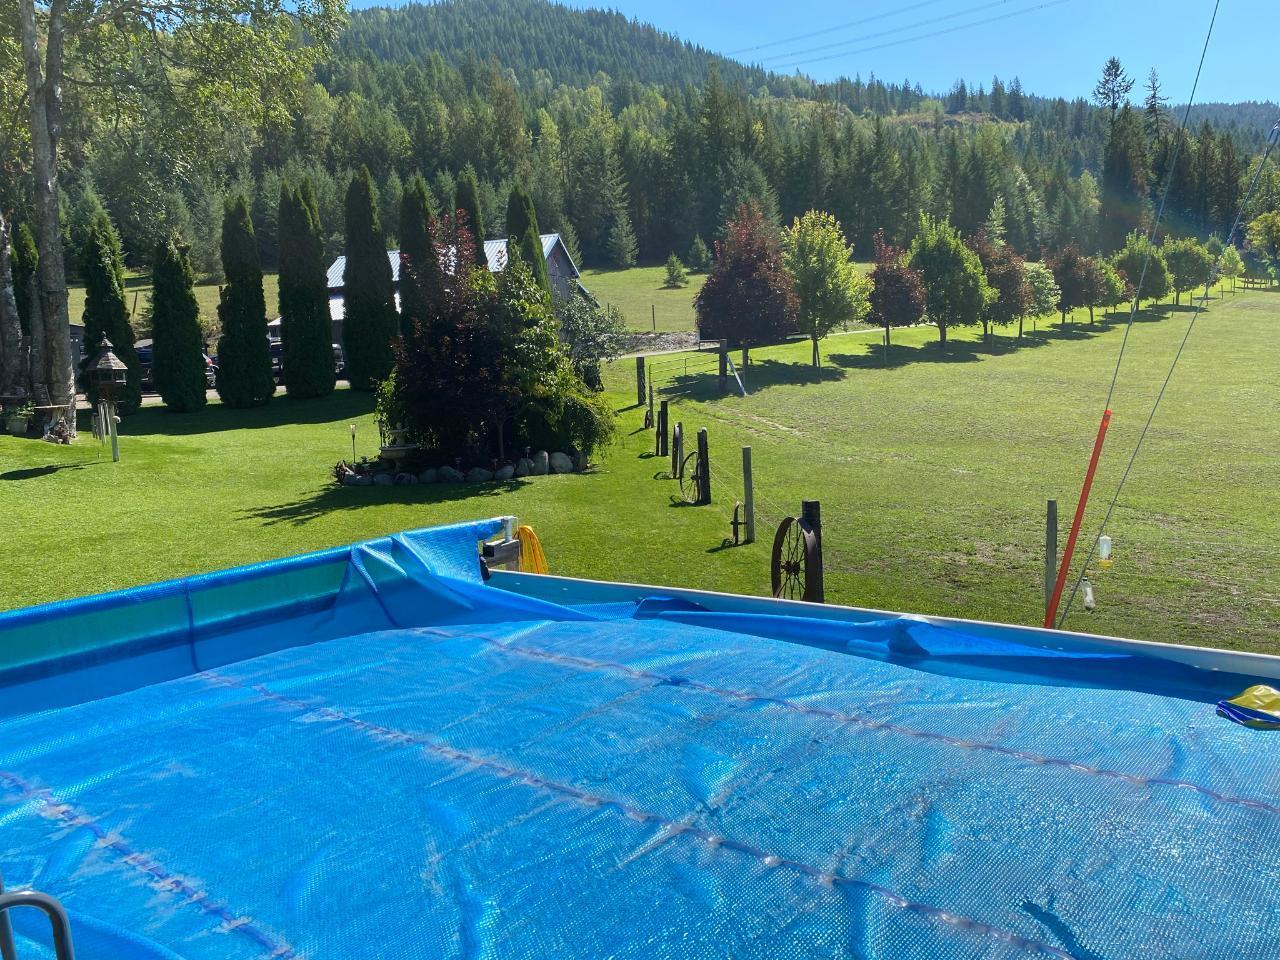 2505 Barley Road, Rossland, British Columbia  V0G 1Y0 - Photo 18 - 2461148